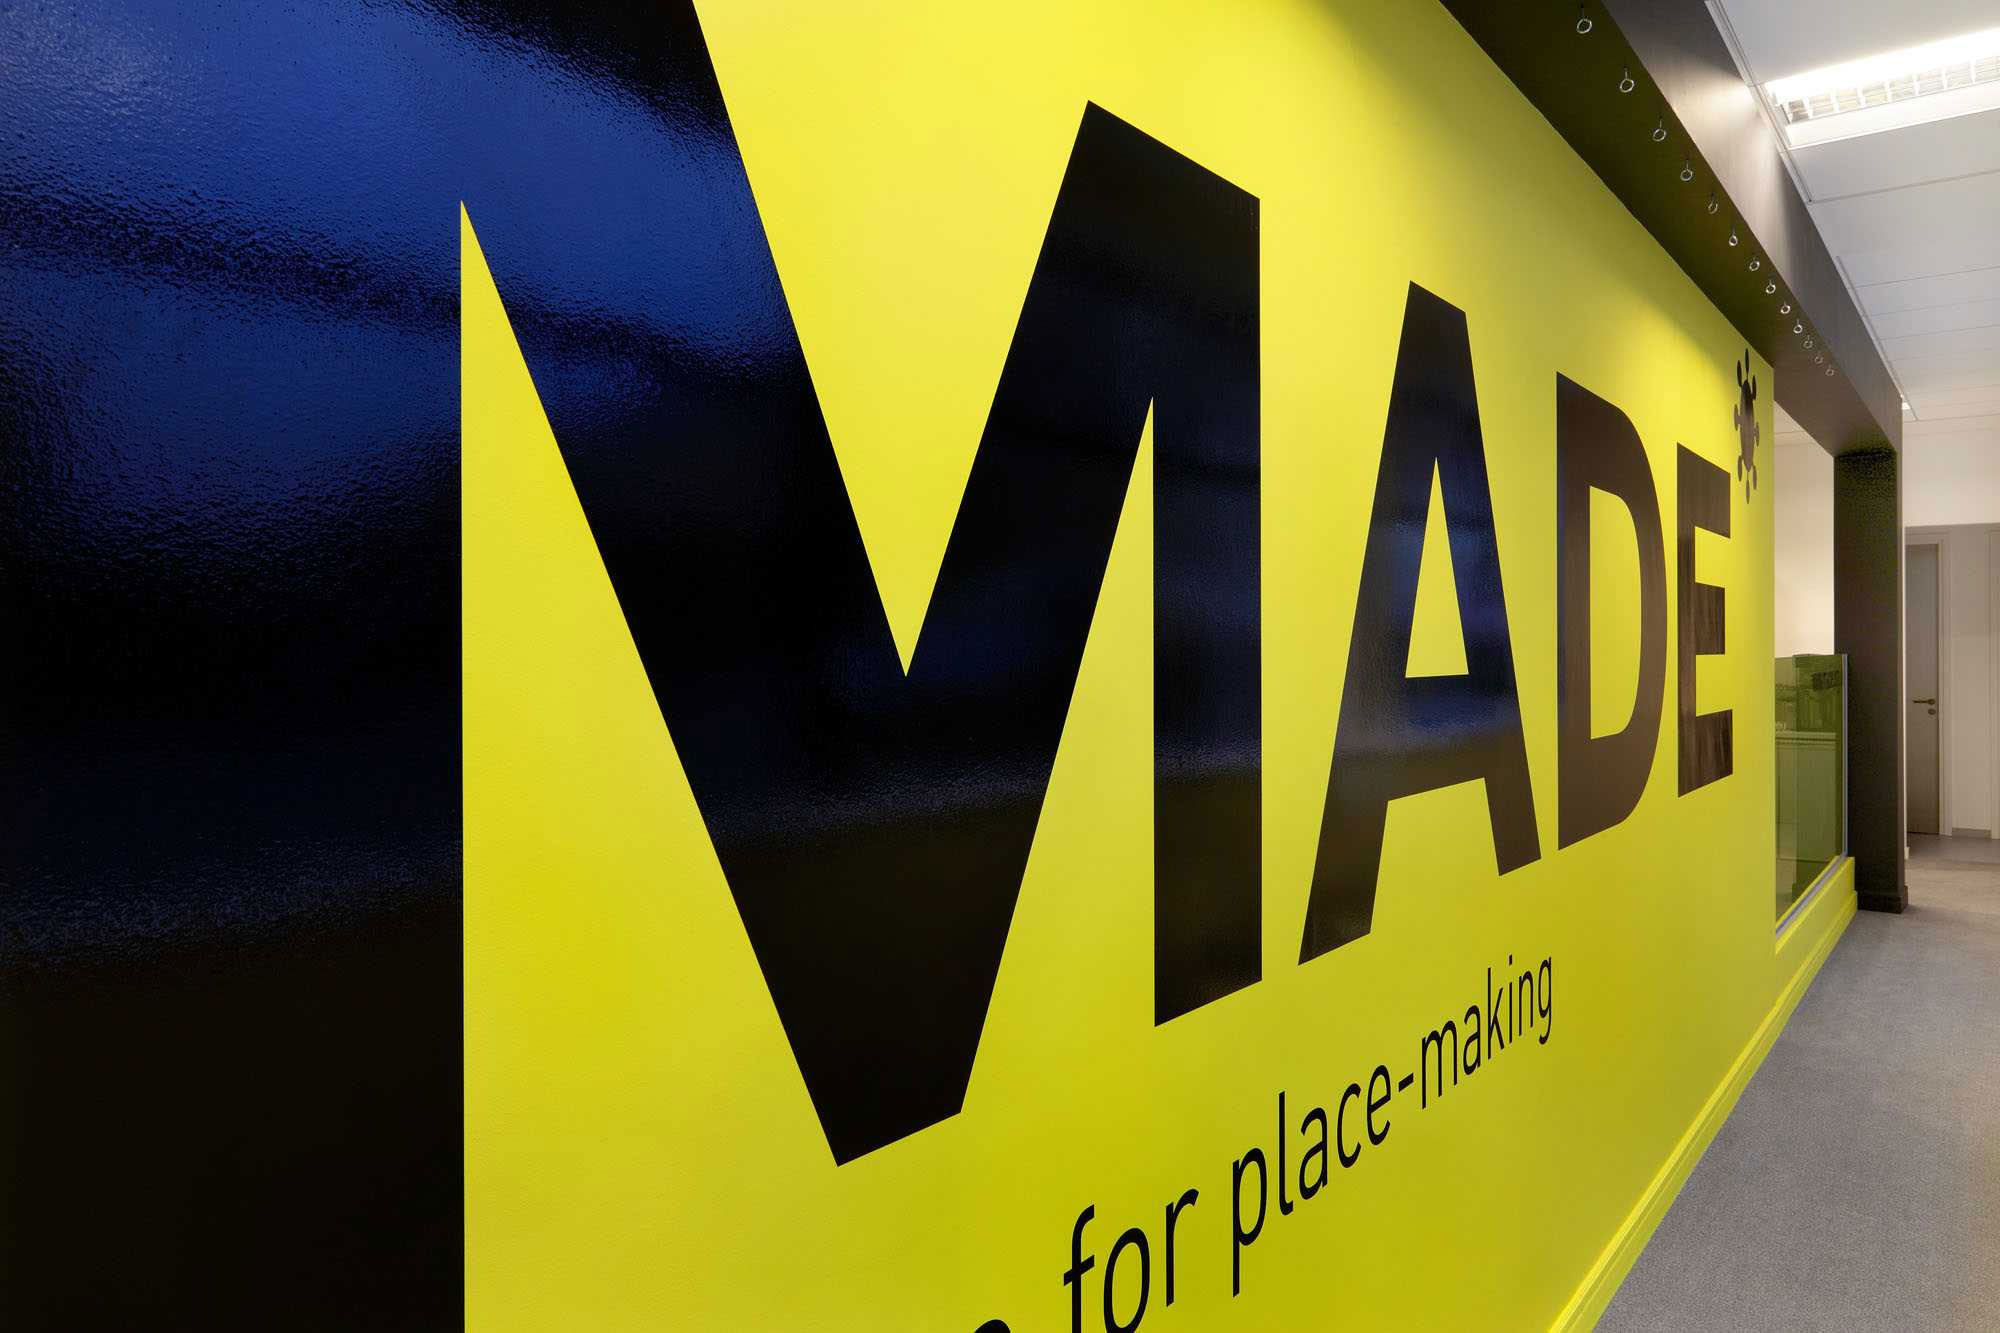 Commercial Architect West Midlands